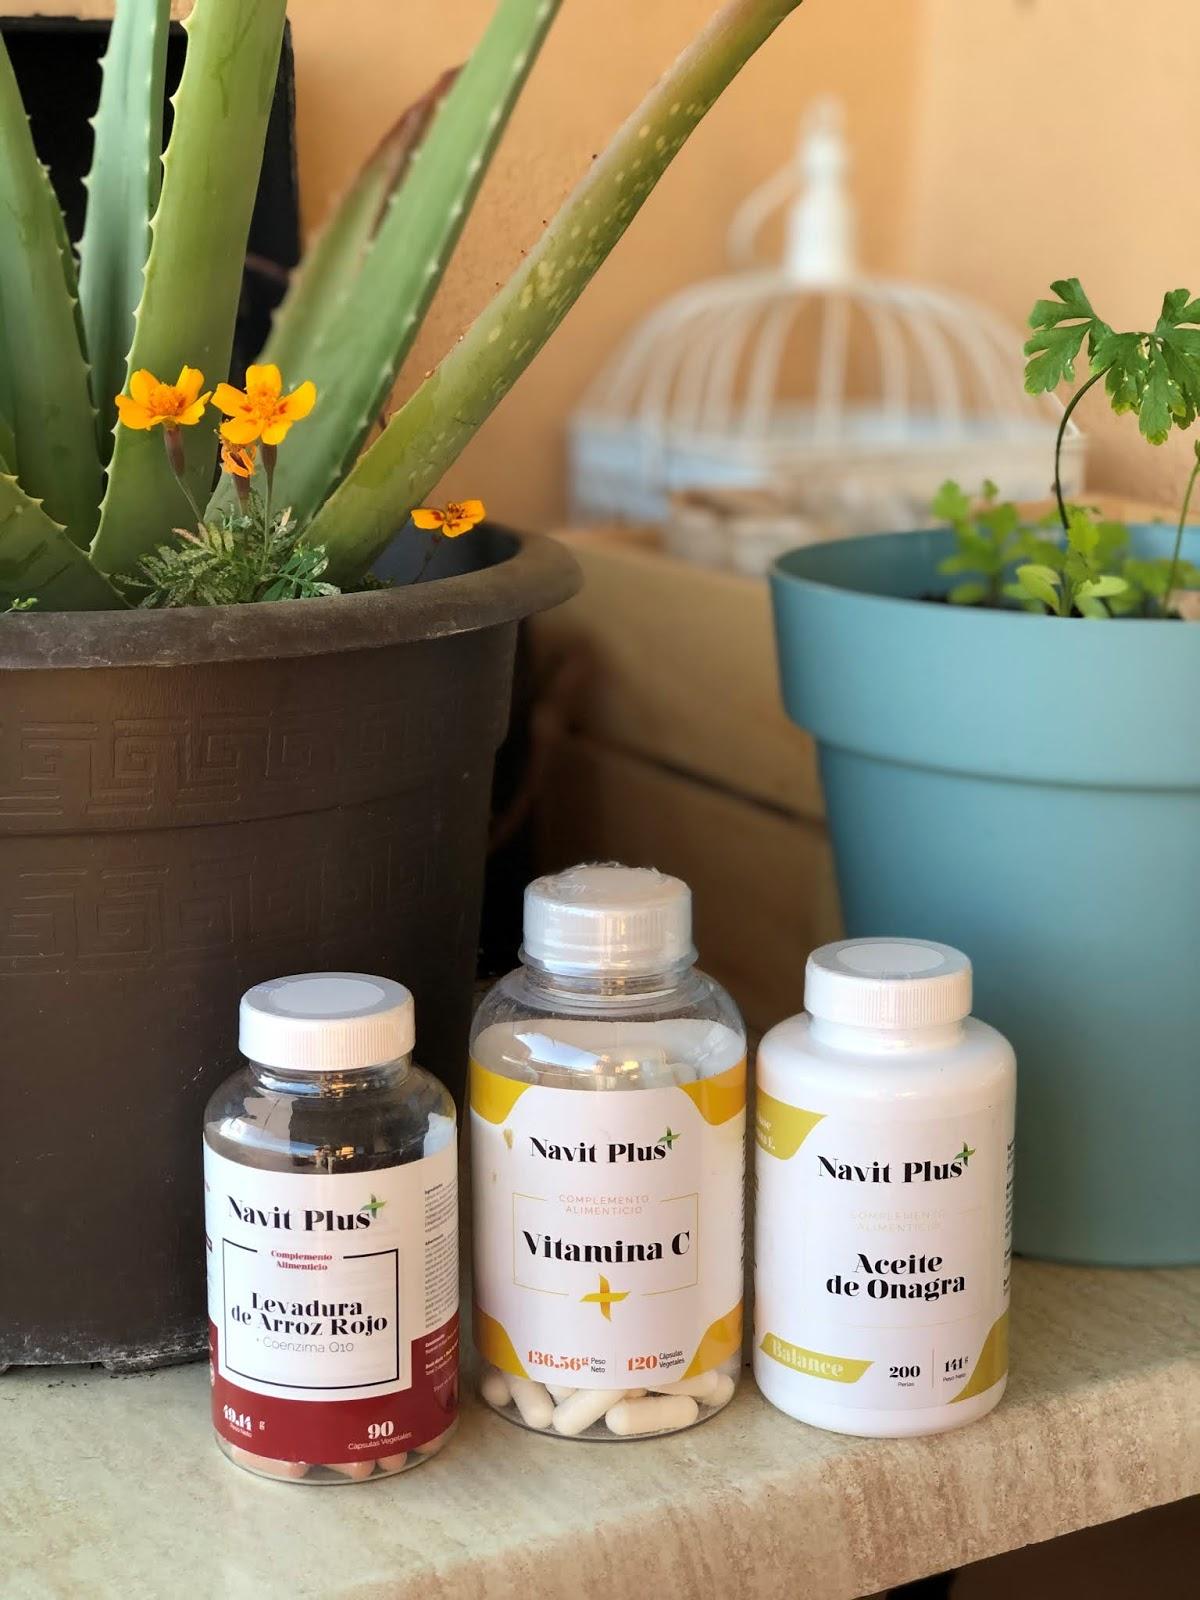 Fitness And Chicness-Suplementos Navit Plus Vitamina C Onagra y Levadura Arroz Rojo-1